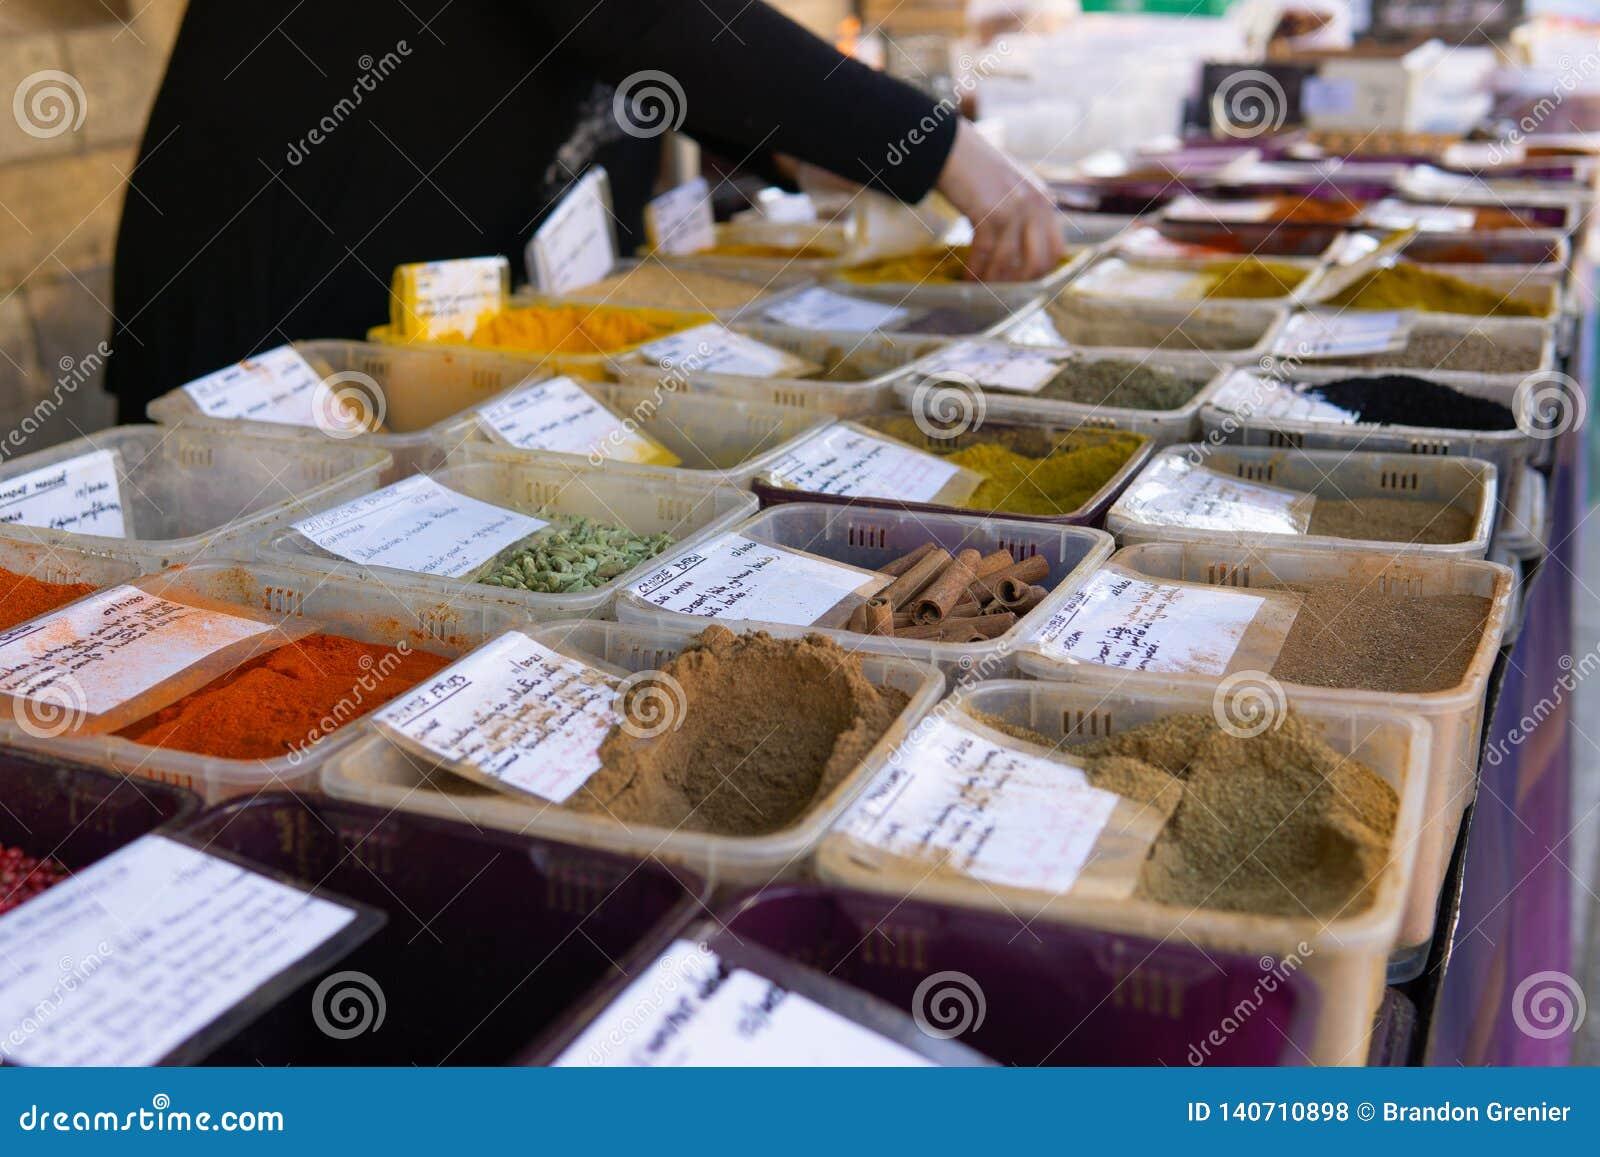 Multicolor улица рынка специи сняла руки служа клиент